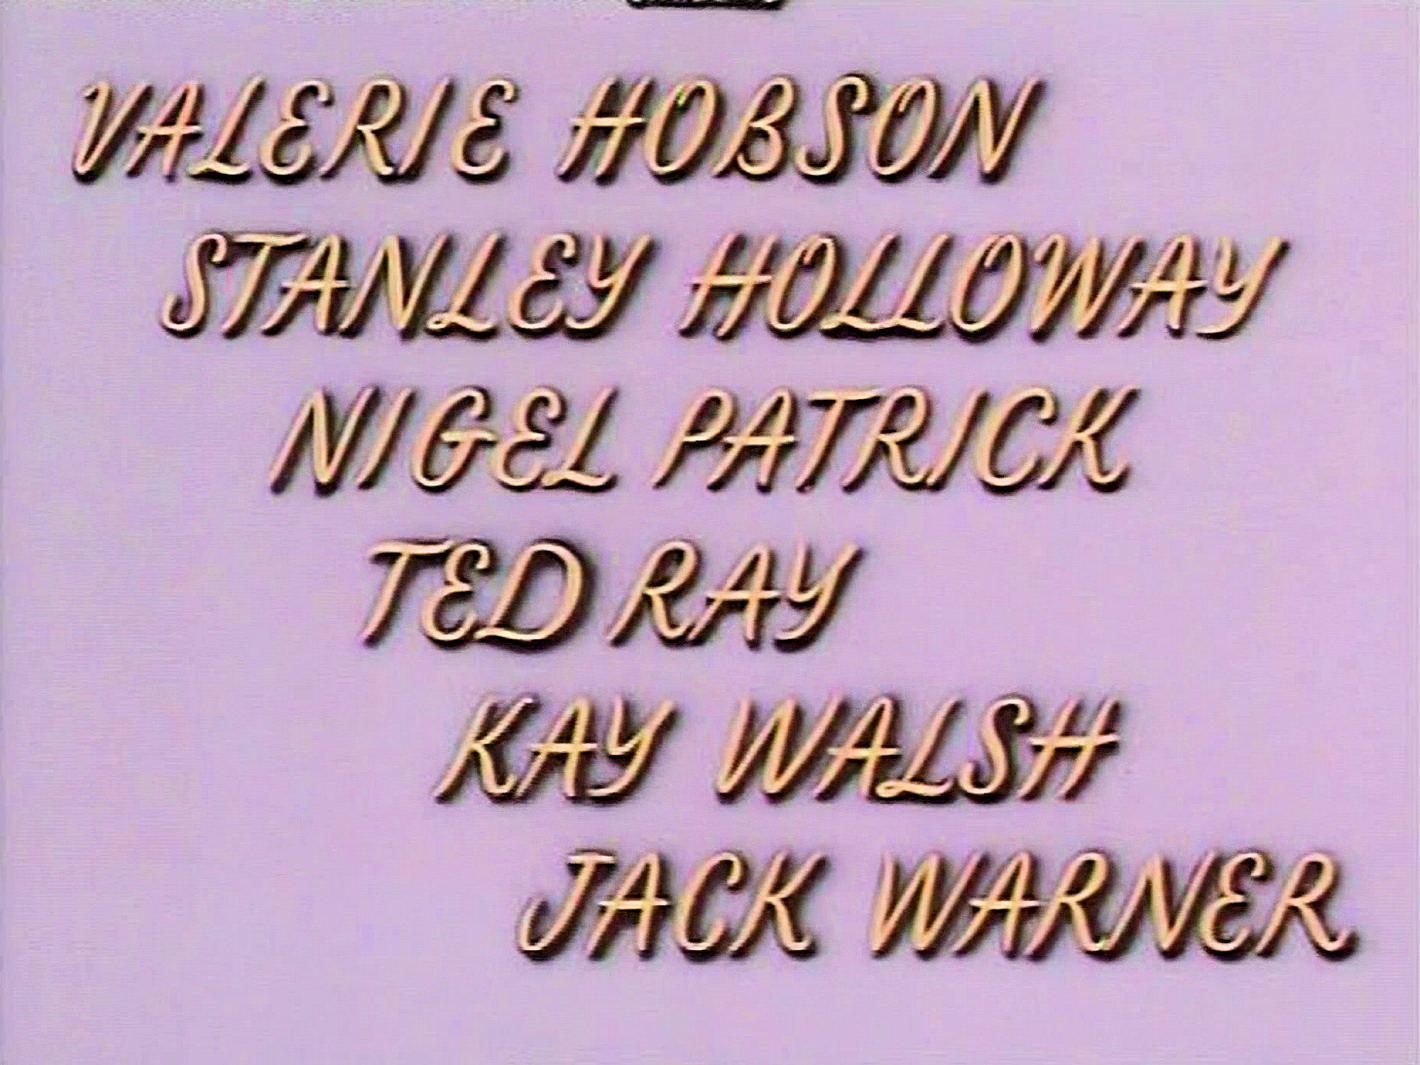 Main title from Meet Me Tonight (1952) (7).  Valerie Hobson Stanley Holloway, Nigel Patrick, Ted Ray, Kay Walsh, Jack Warner